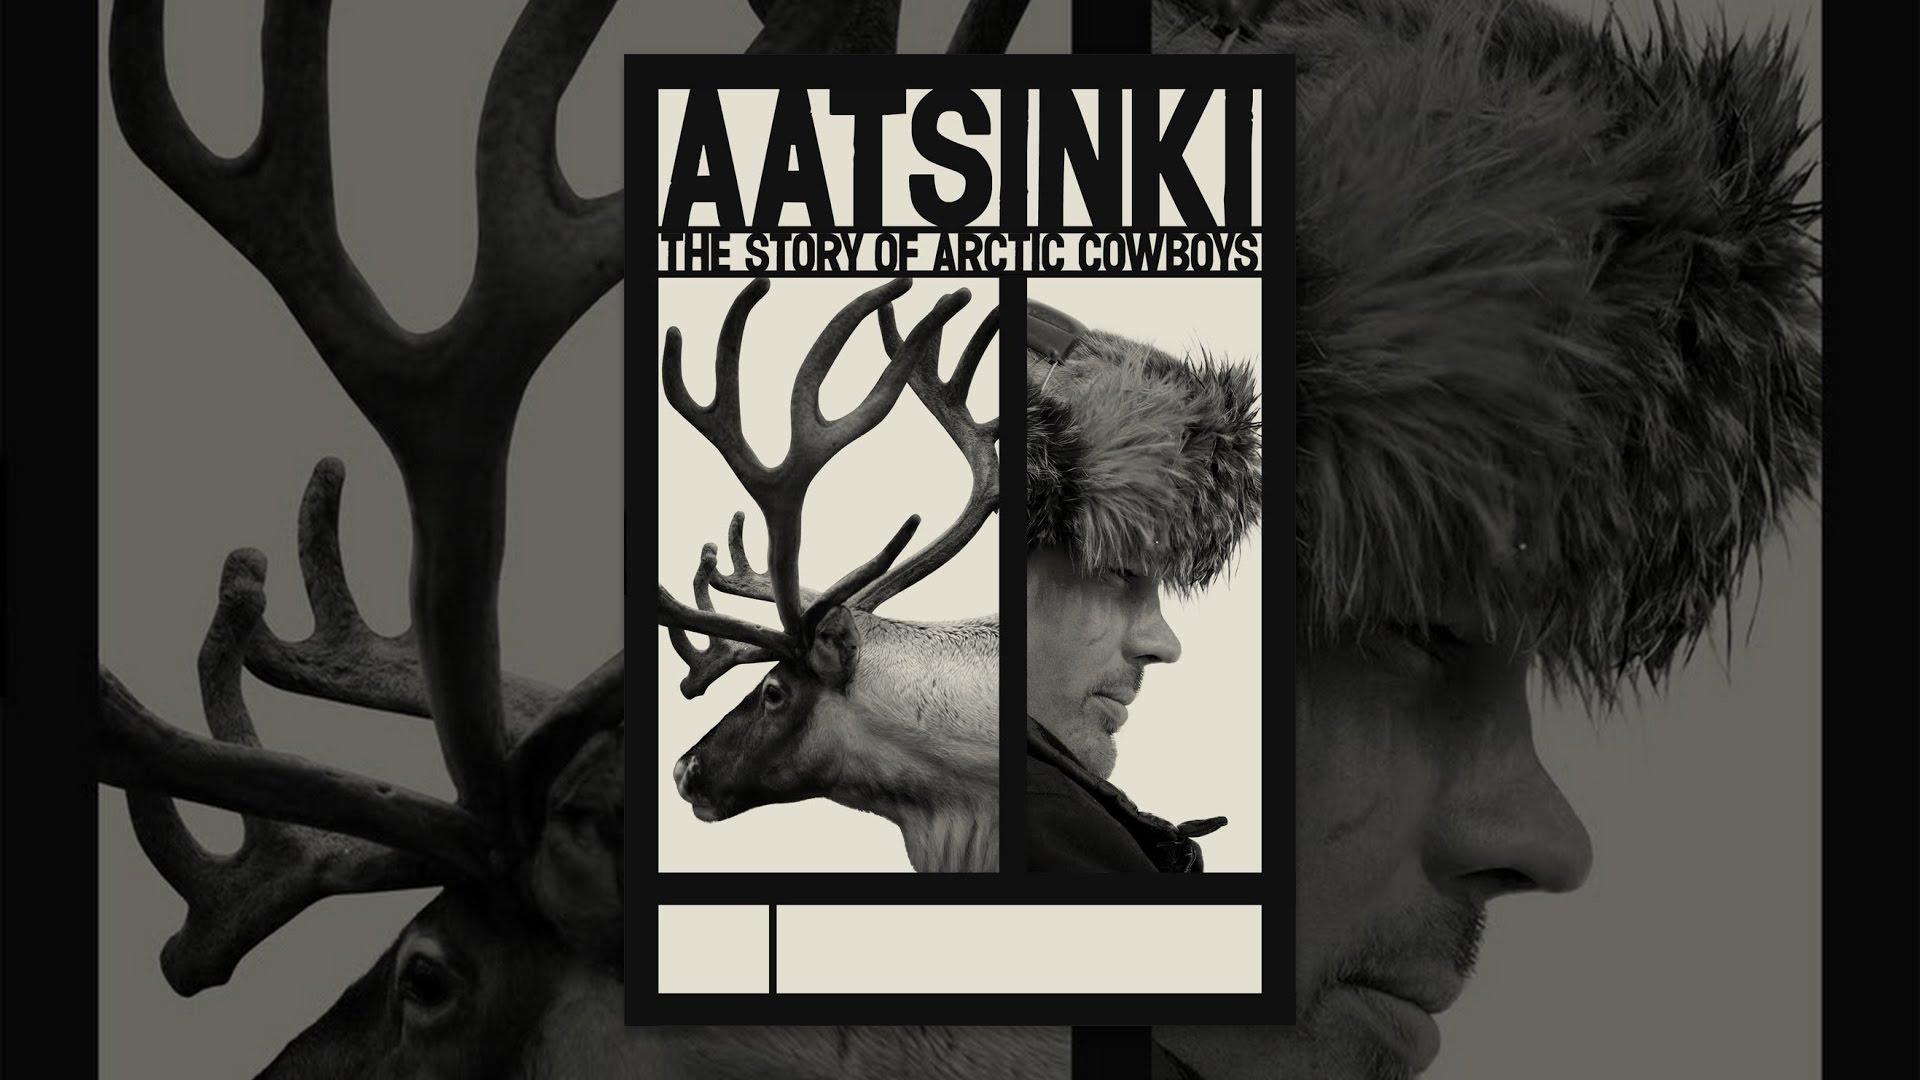 Aatsinki the story of arctic cowboys online dating 7